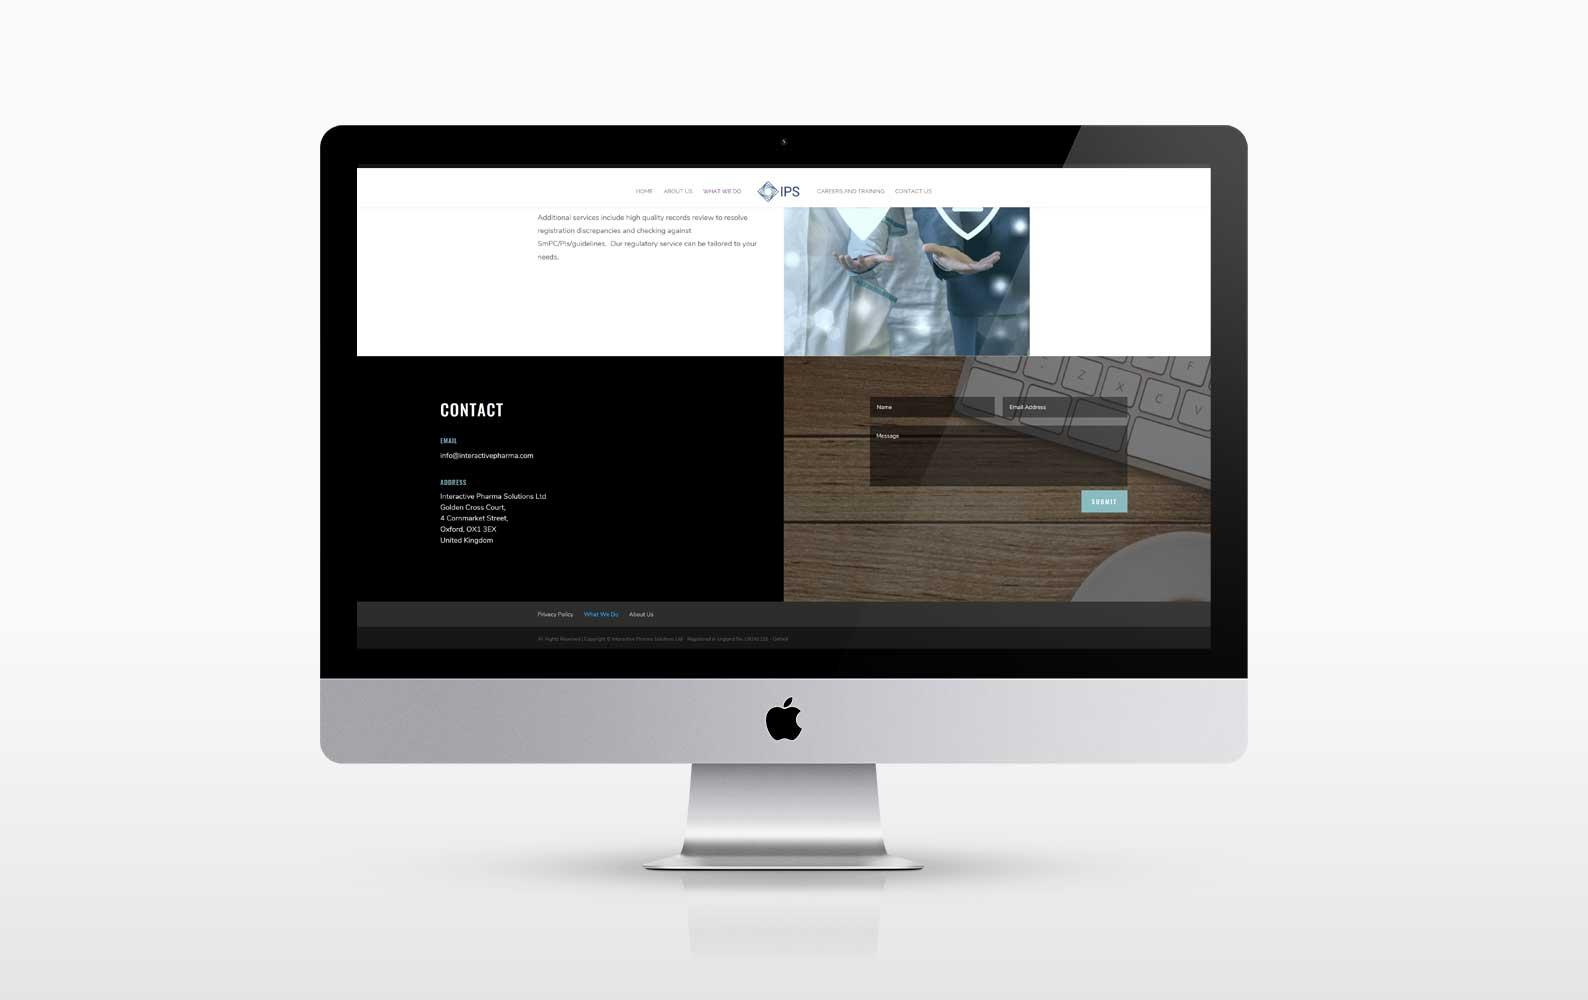 Screen Shot New responsive wordpress website for a pharma company in Oxford